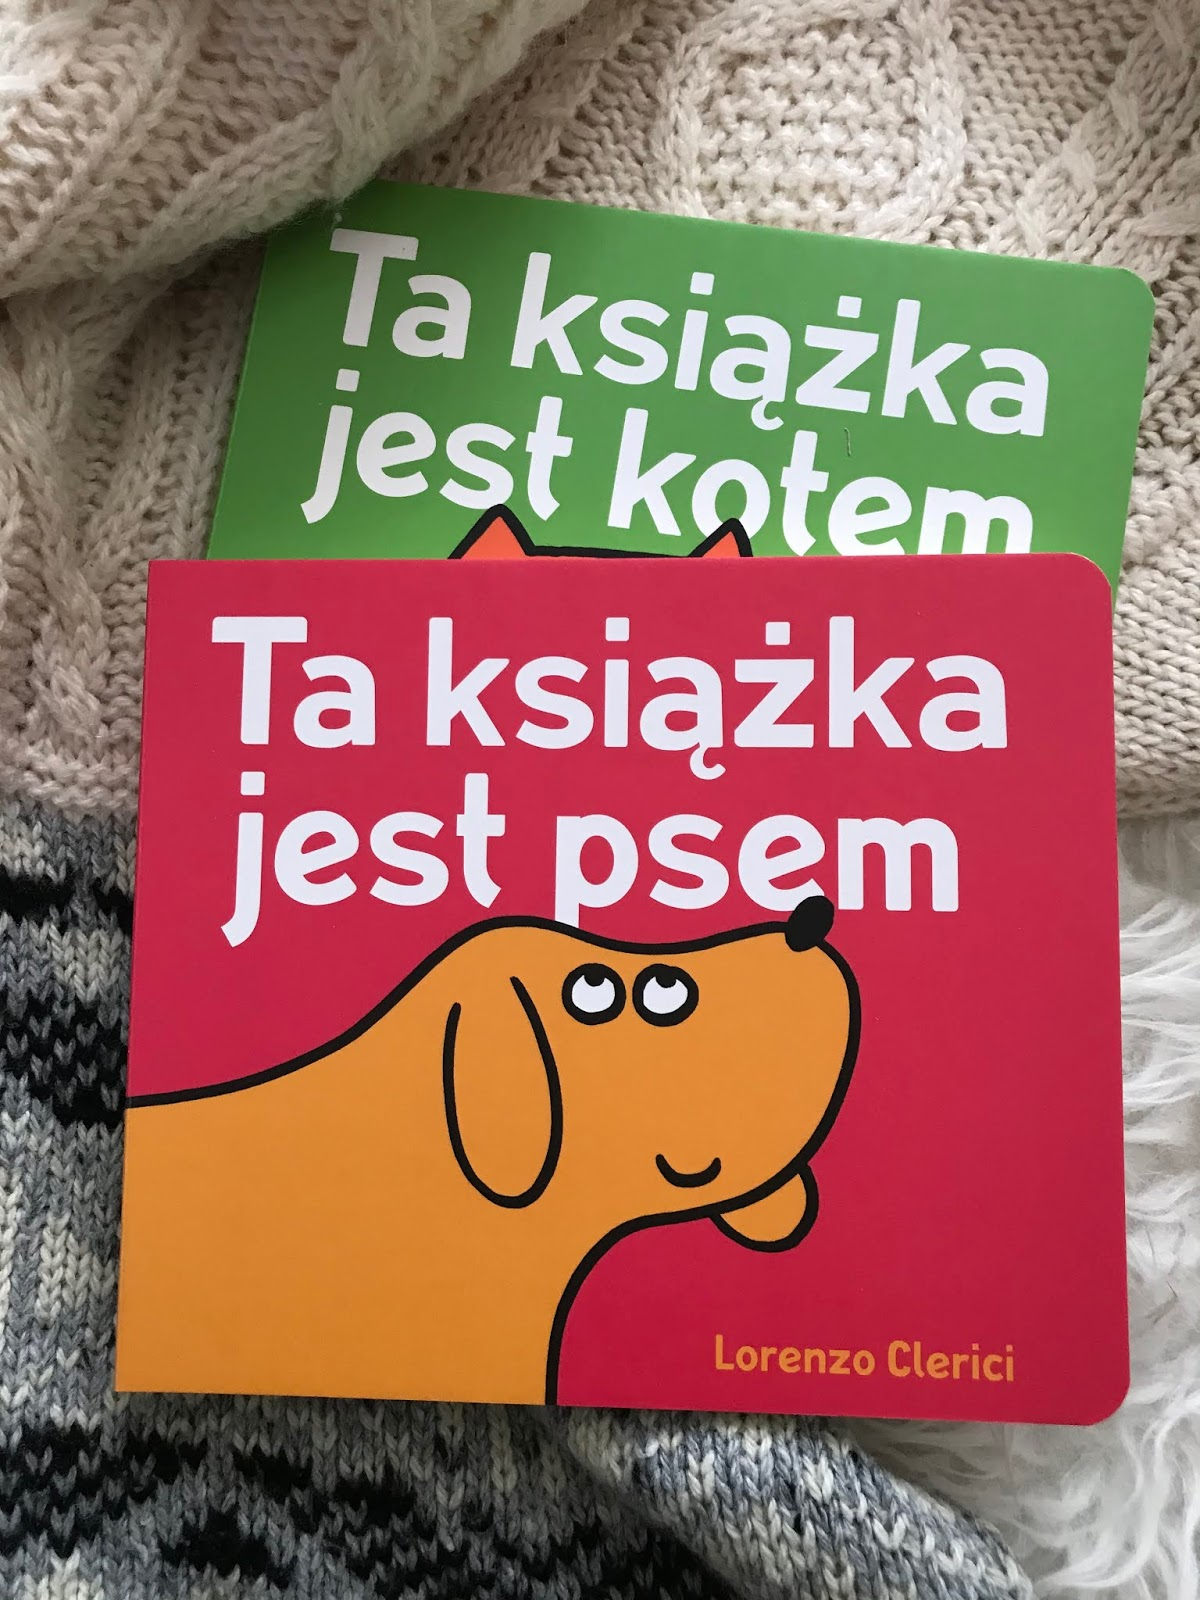 Lorenzo Clerici, Ta książka jest psem